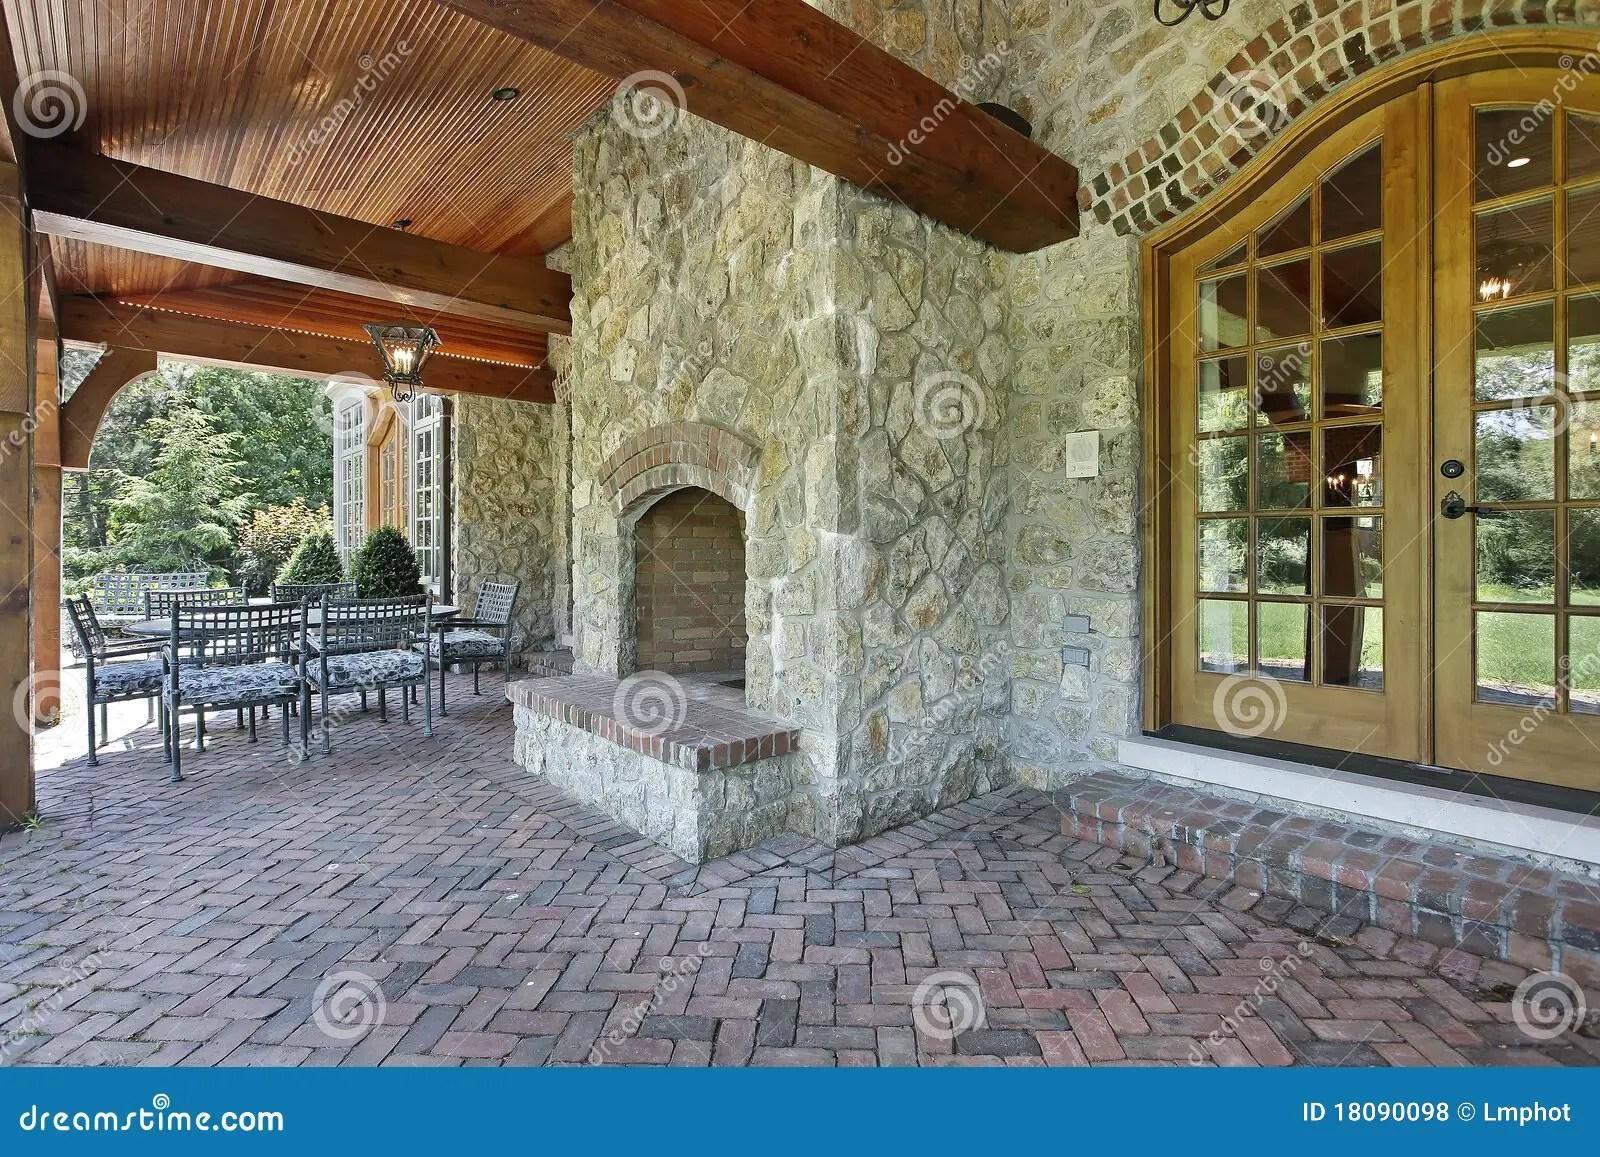 Brick Patio With Stone Fireplace Royalty Free Stock Photos  Image 18090098